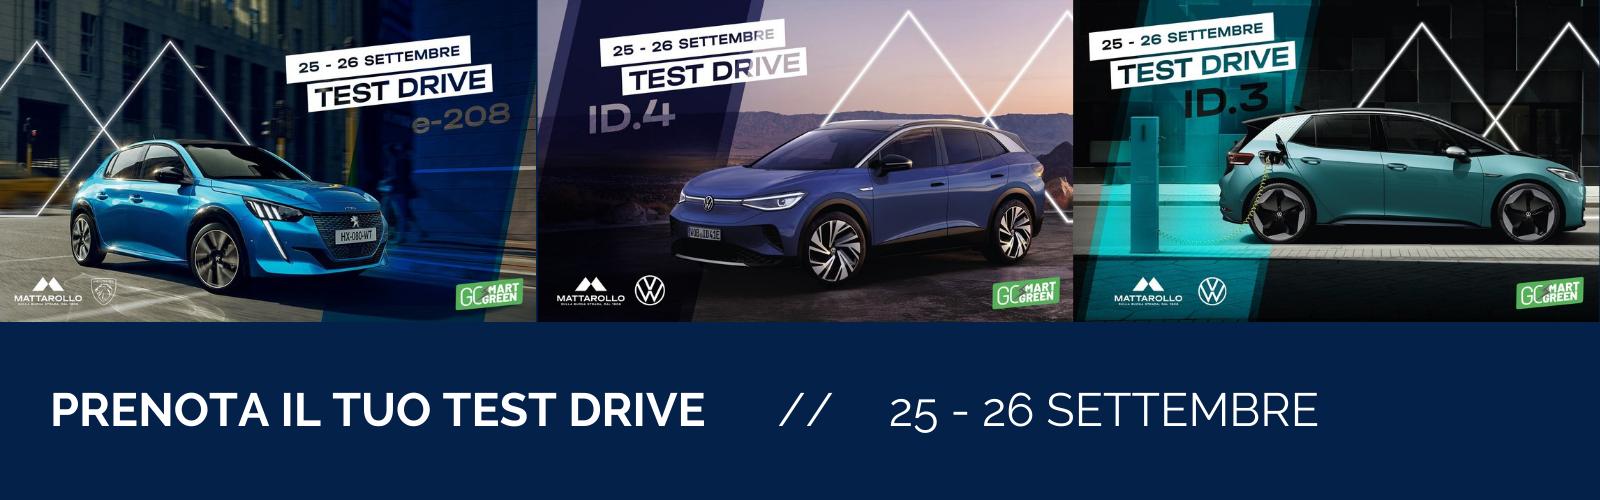 TEST DRIVE - GO SMART GO GREEN